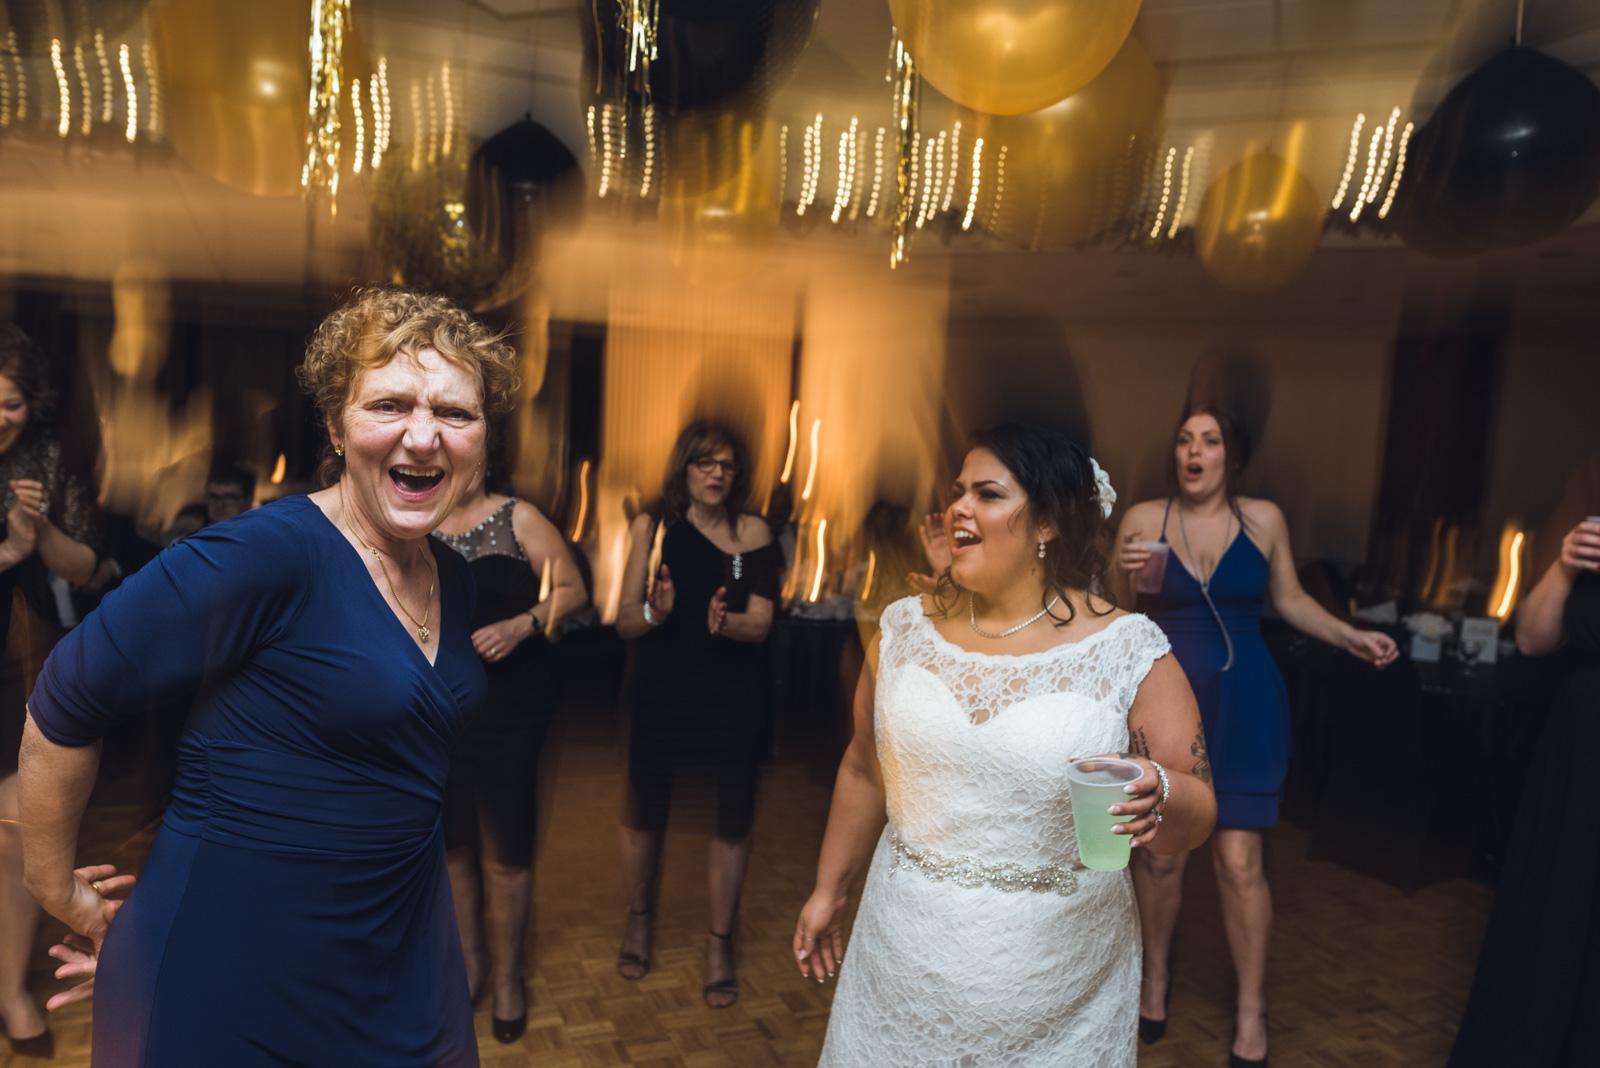 rheana-chris-wedding-blog-322.jpg